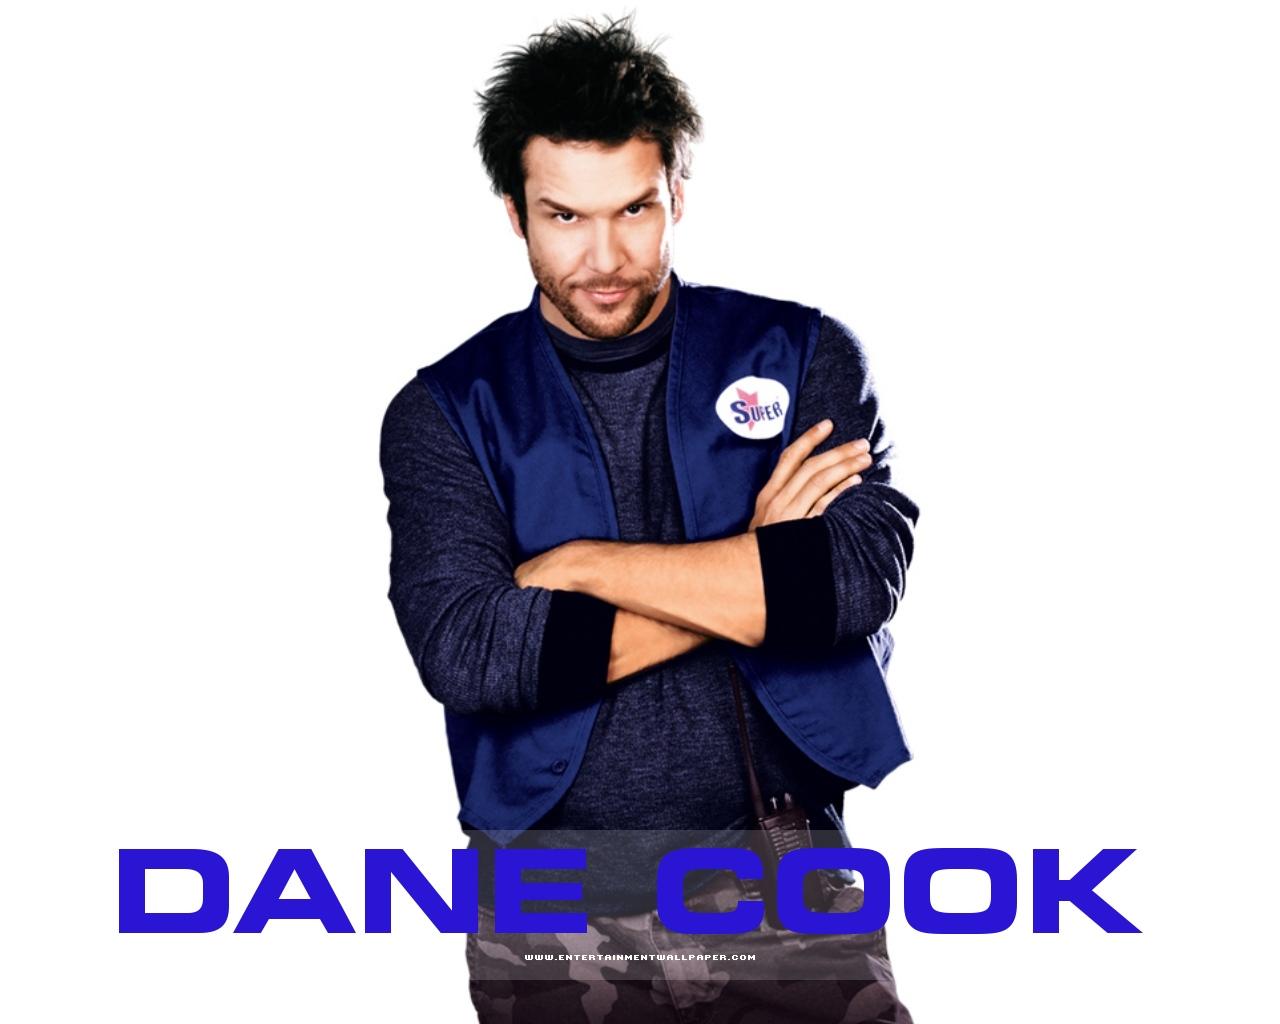 Blogger For Wallpaper: Dane Cook Hd